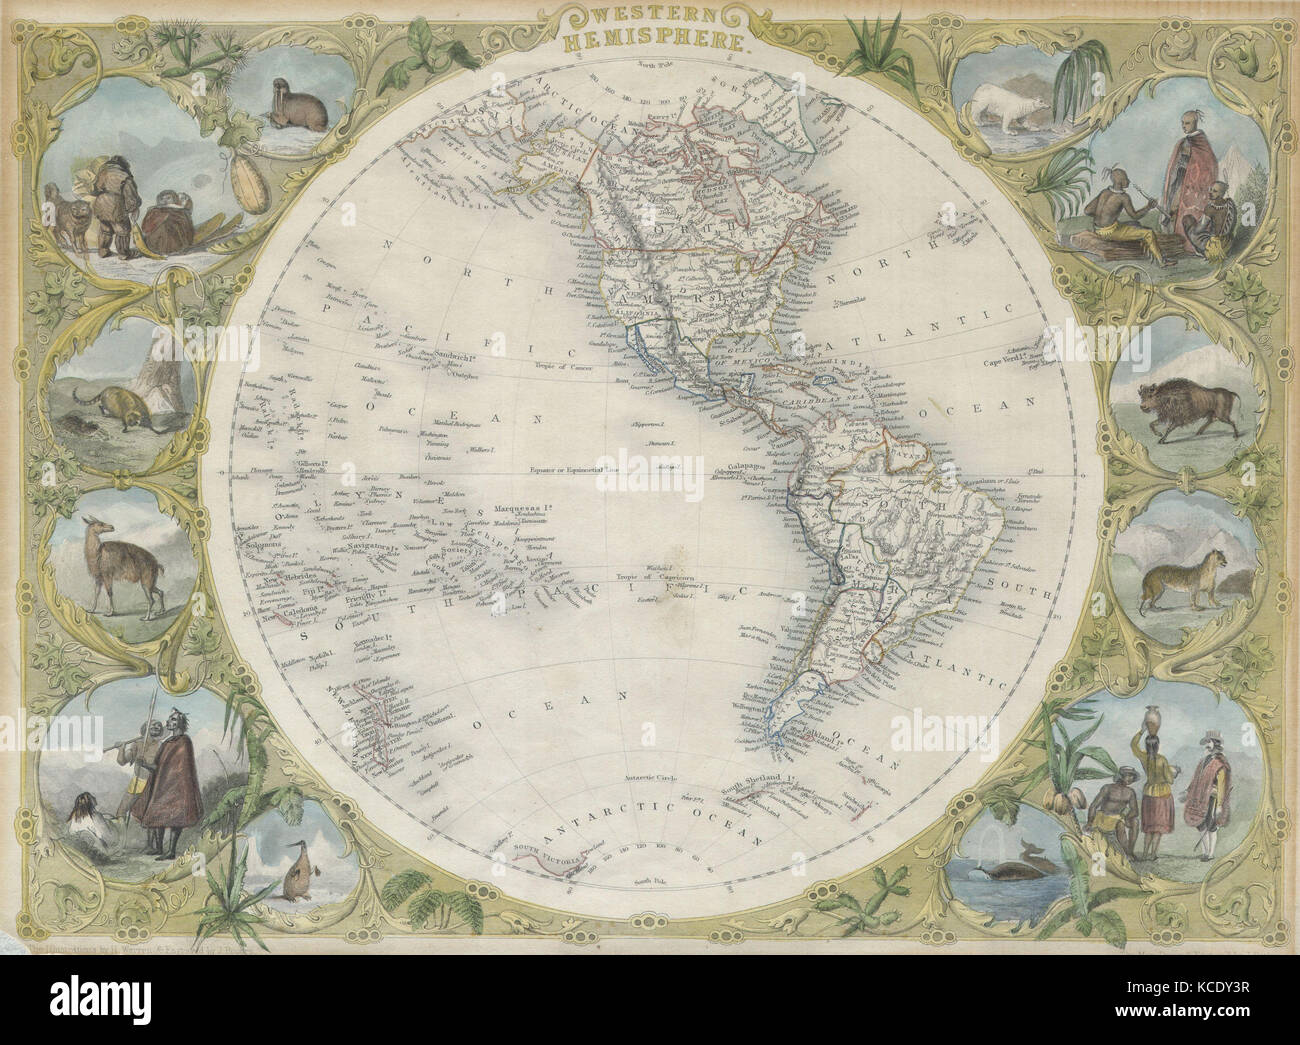 1850, Tallis Map of the Western Hemisphere - Stock Image